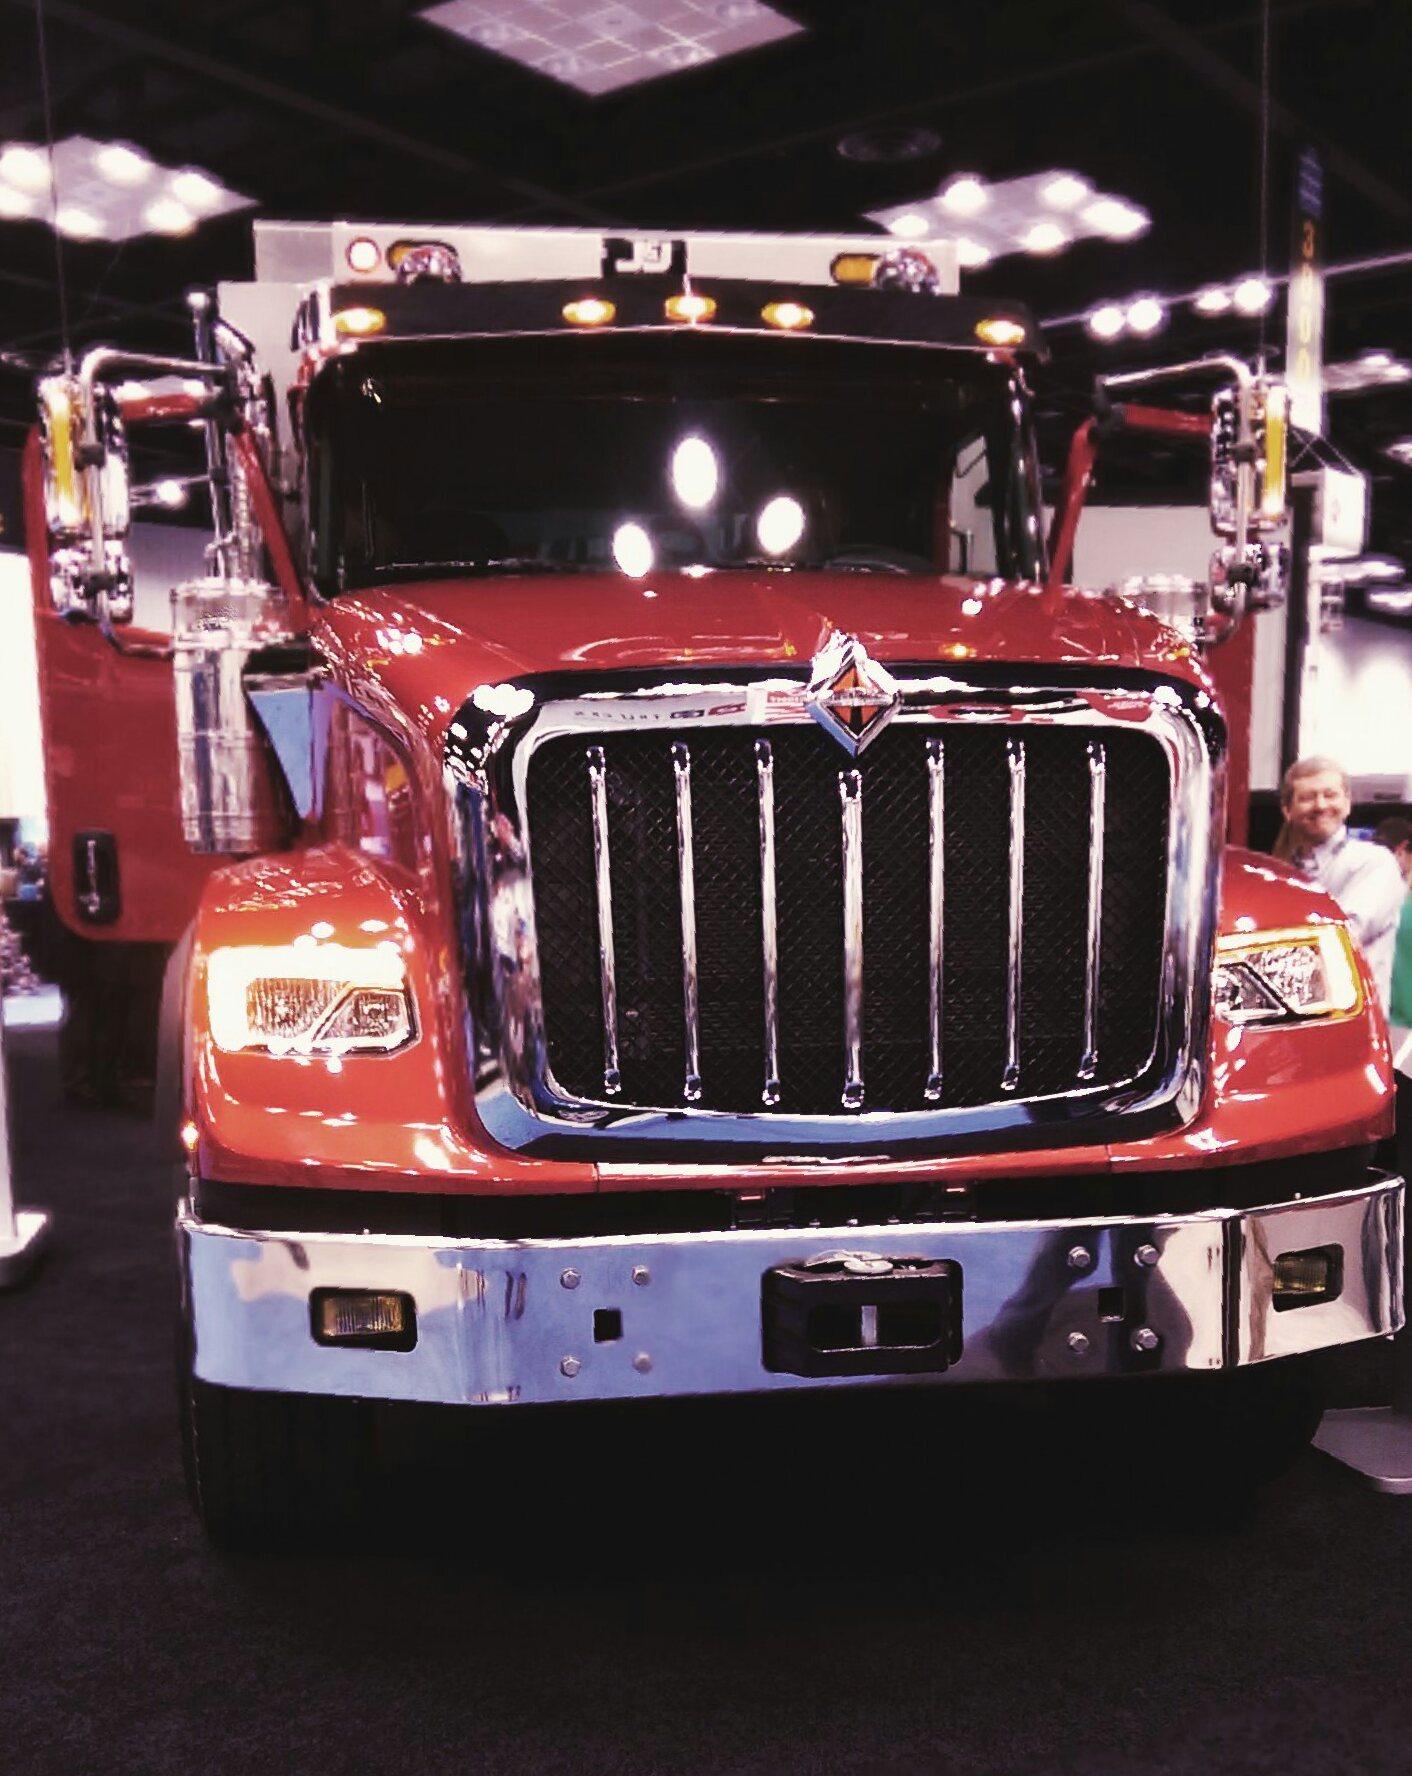 hx series headlines international truck announcements at work truck show